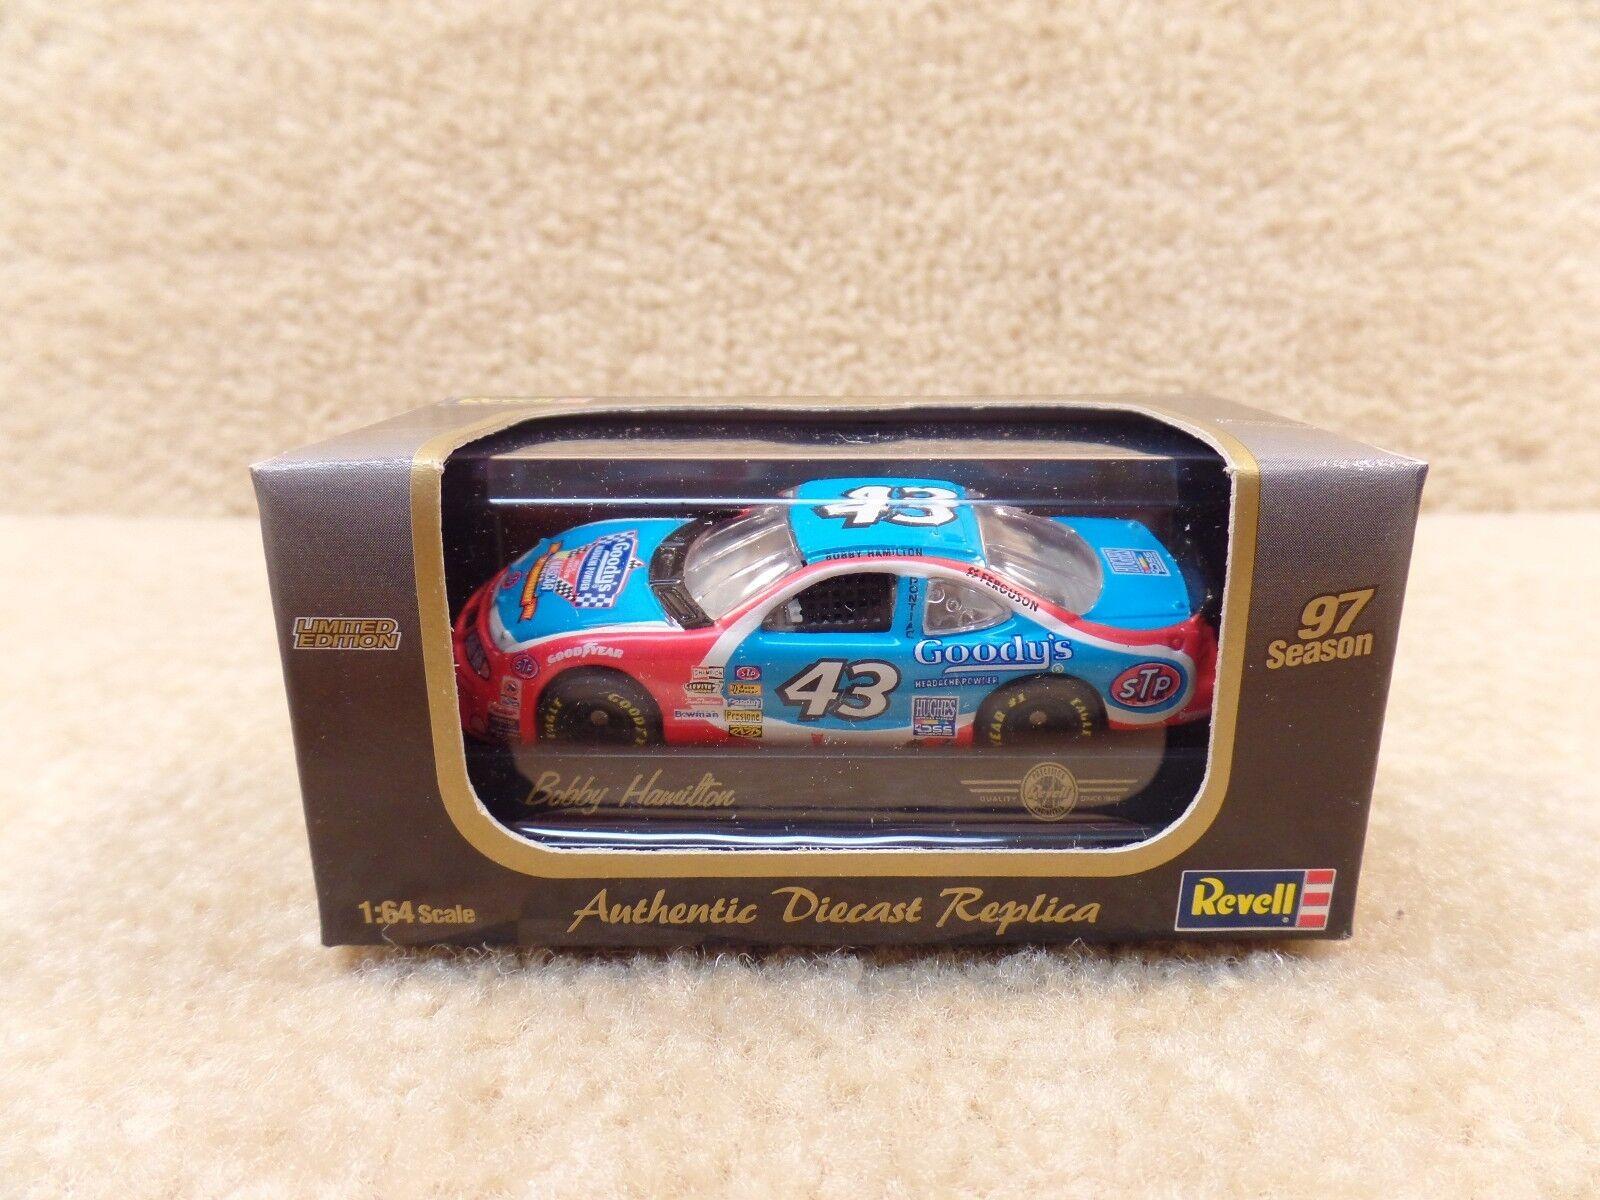 New 1997 Revell 1 64 Diecast NASCAR Bobby Hamilton Goodys Petty STP Grand Prix